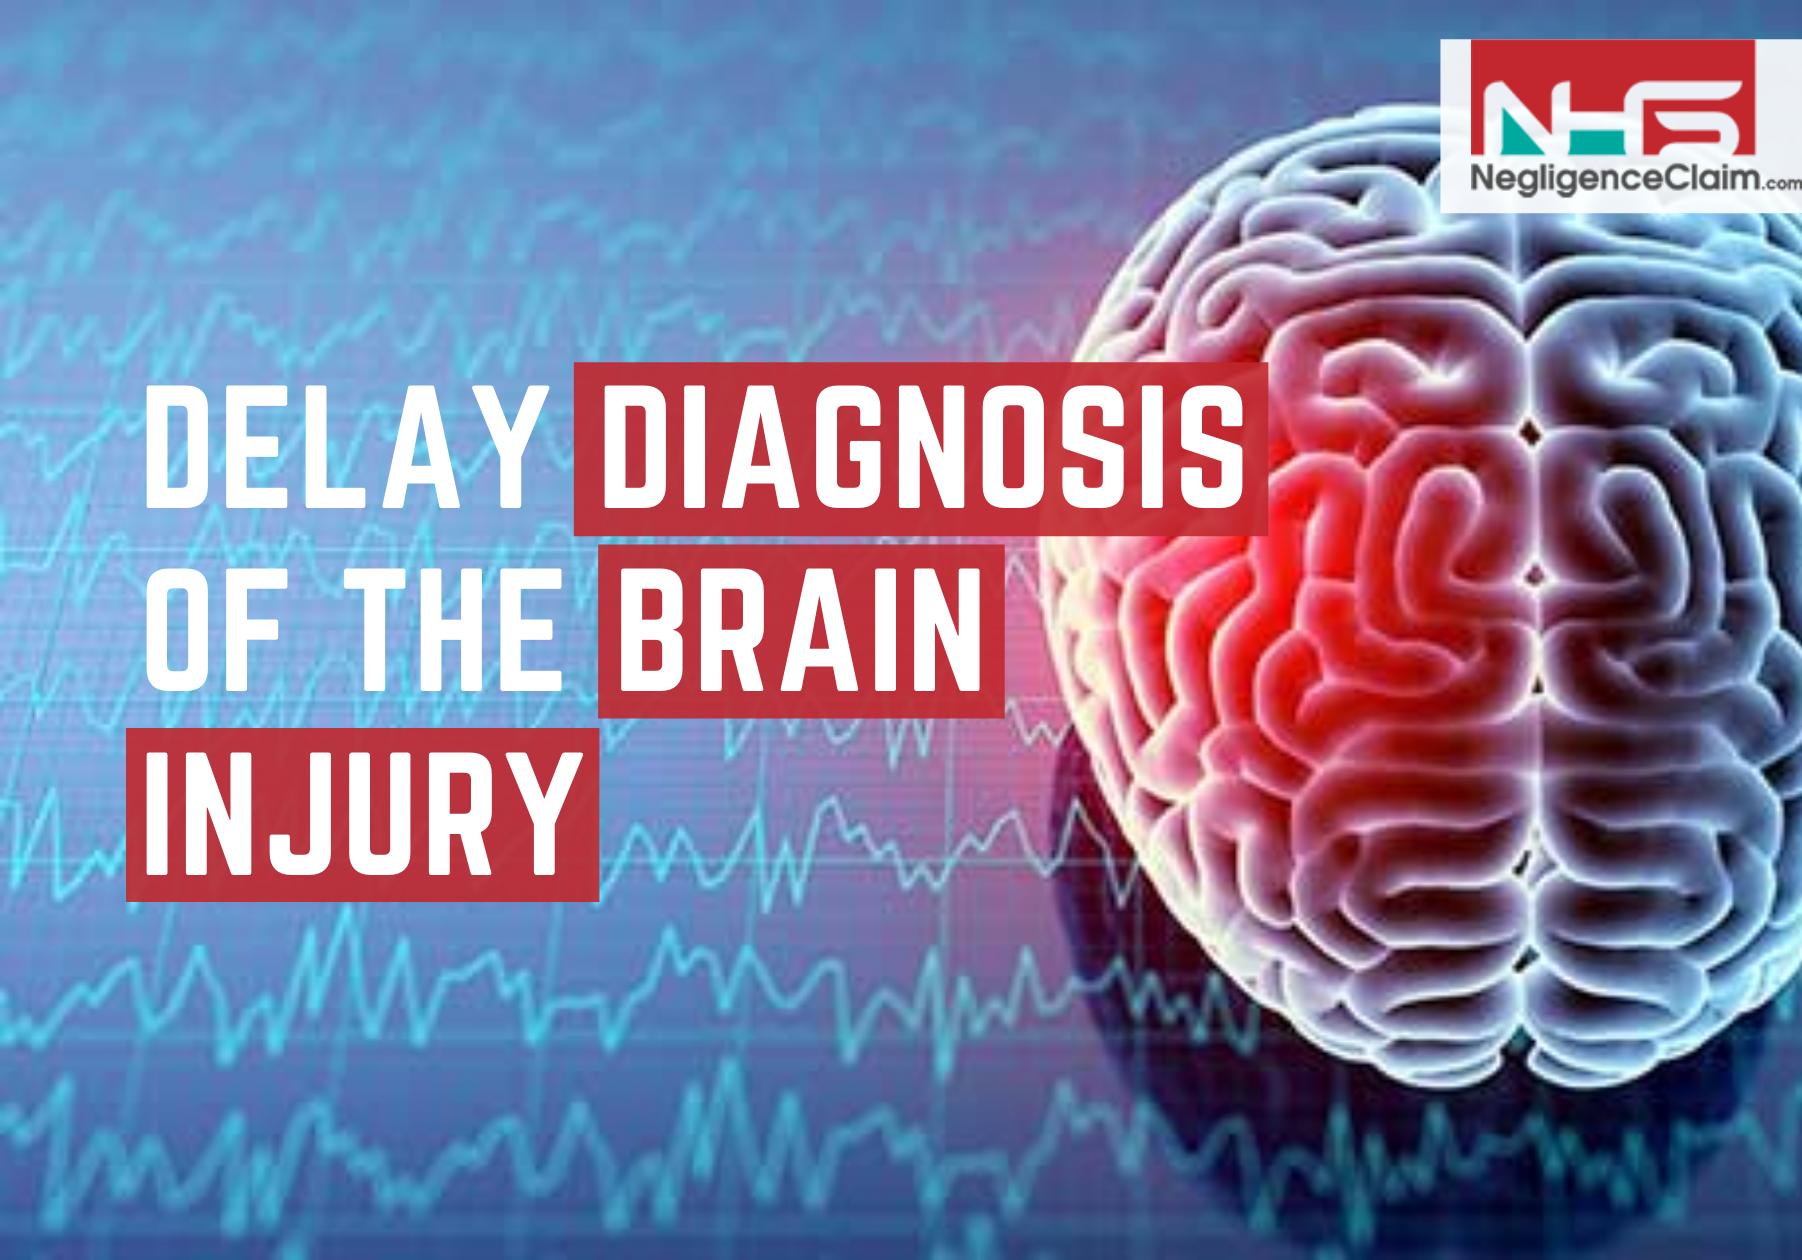 Delay Diagnosis Of The Brain Injury